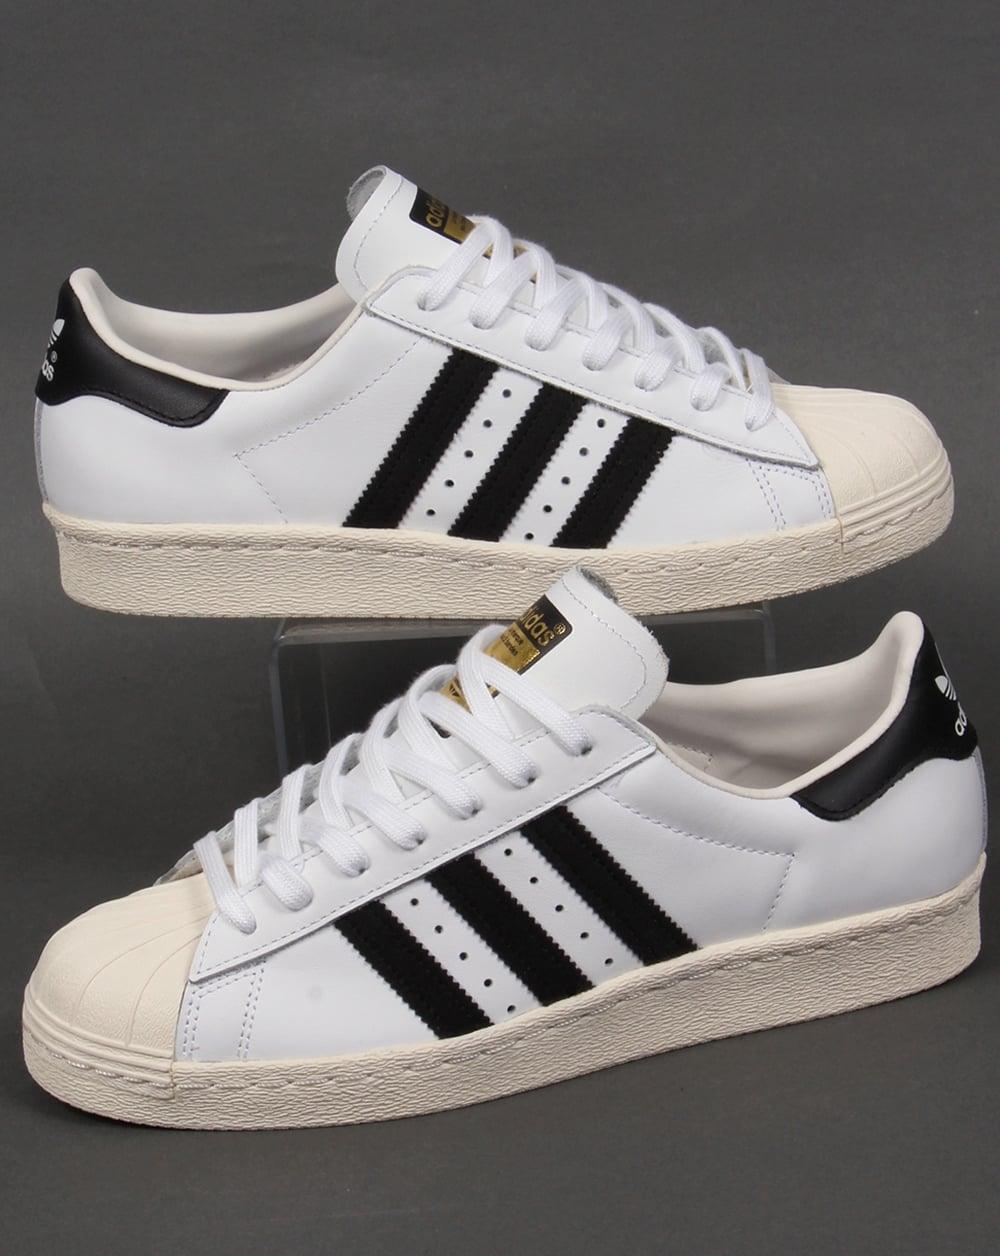 adidas superstar 80s trainers white black originals shell toe shoe. Black Bedroom Furniture Sets. Home Design Ideas